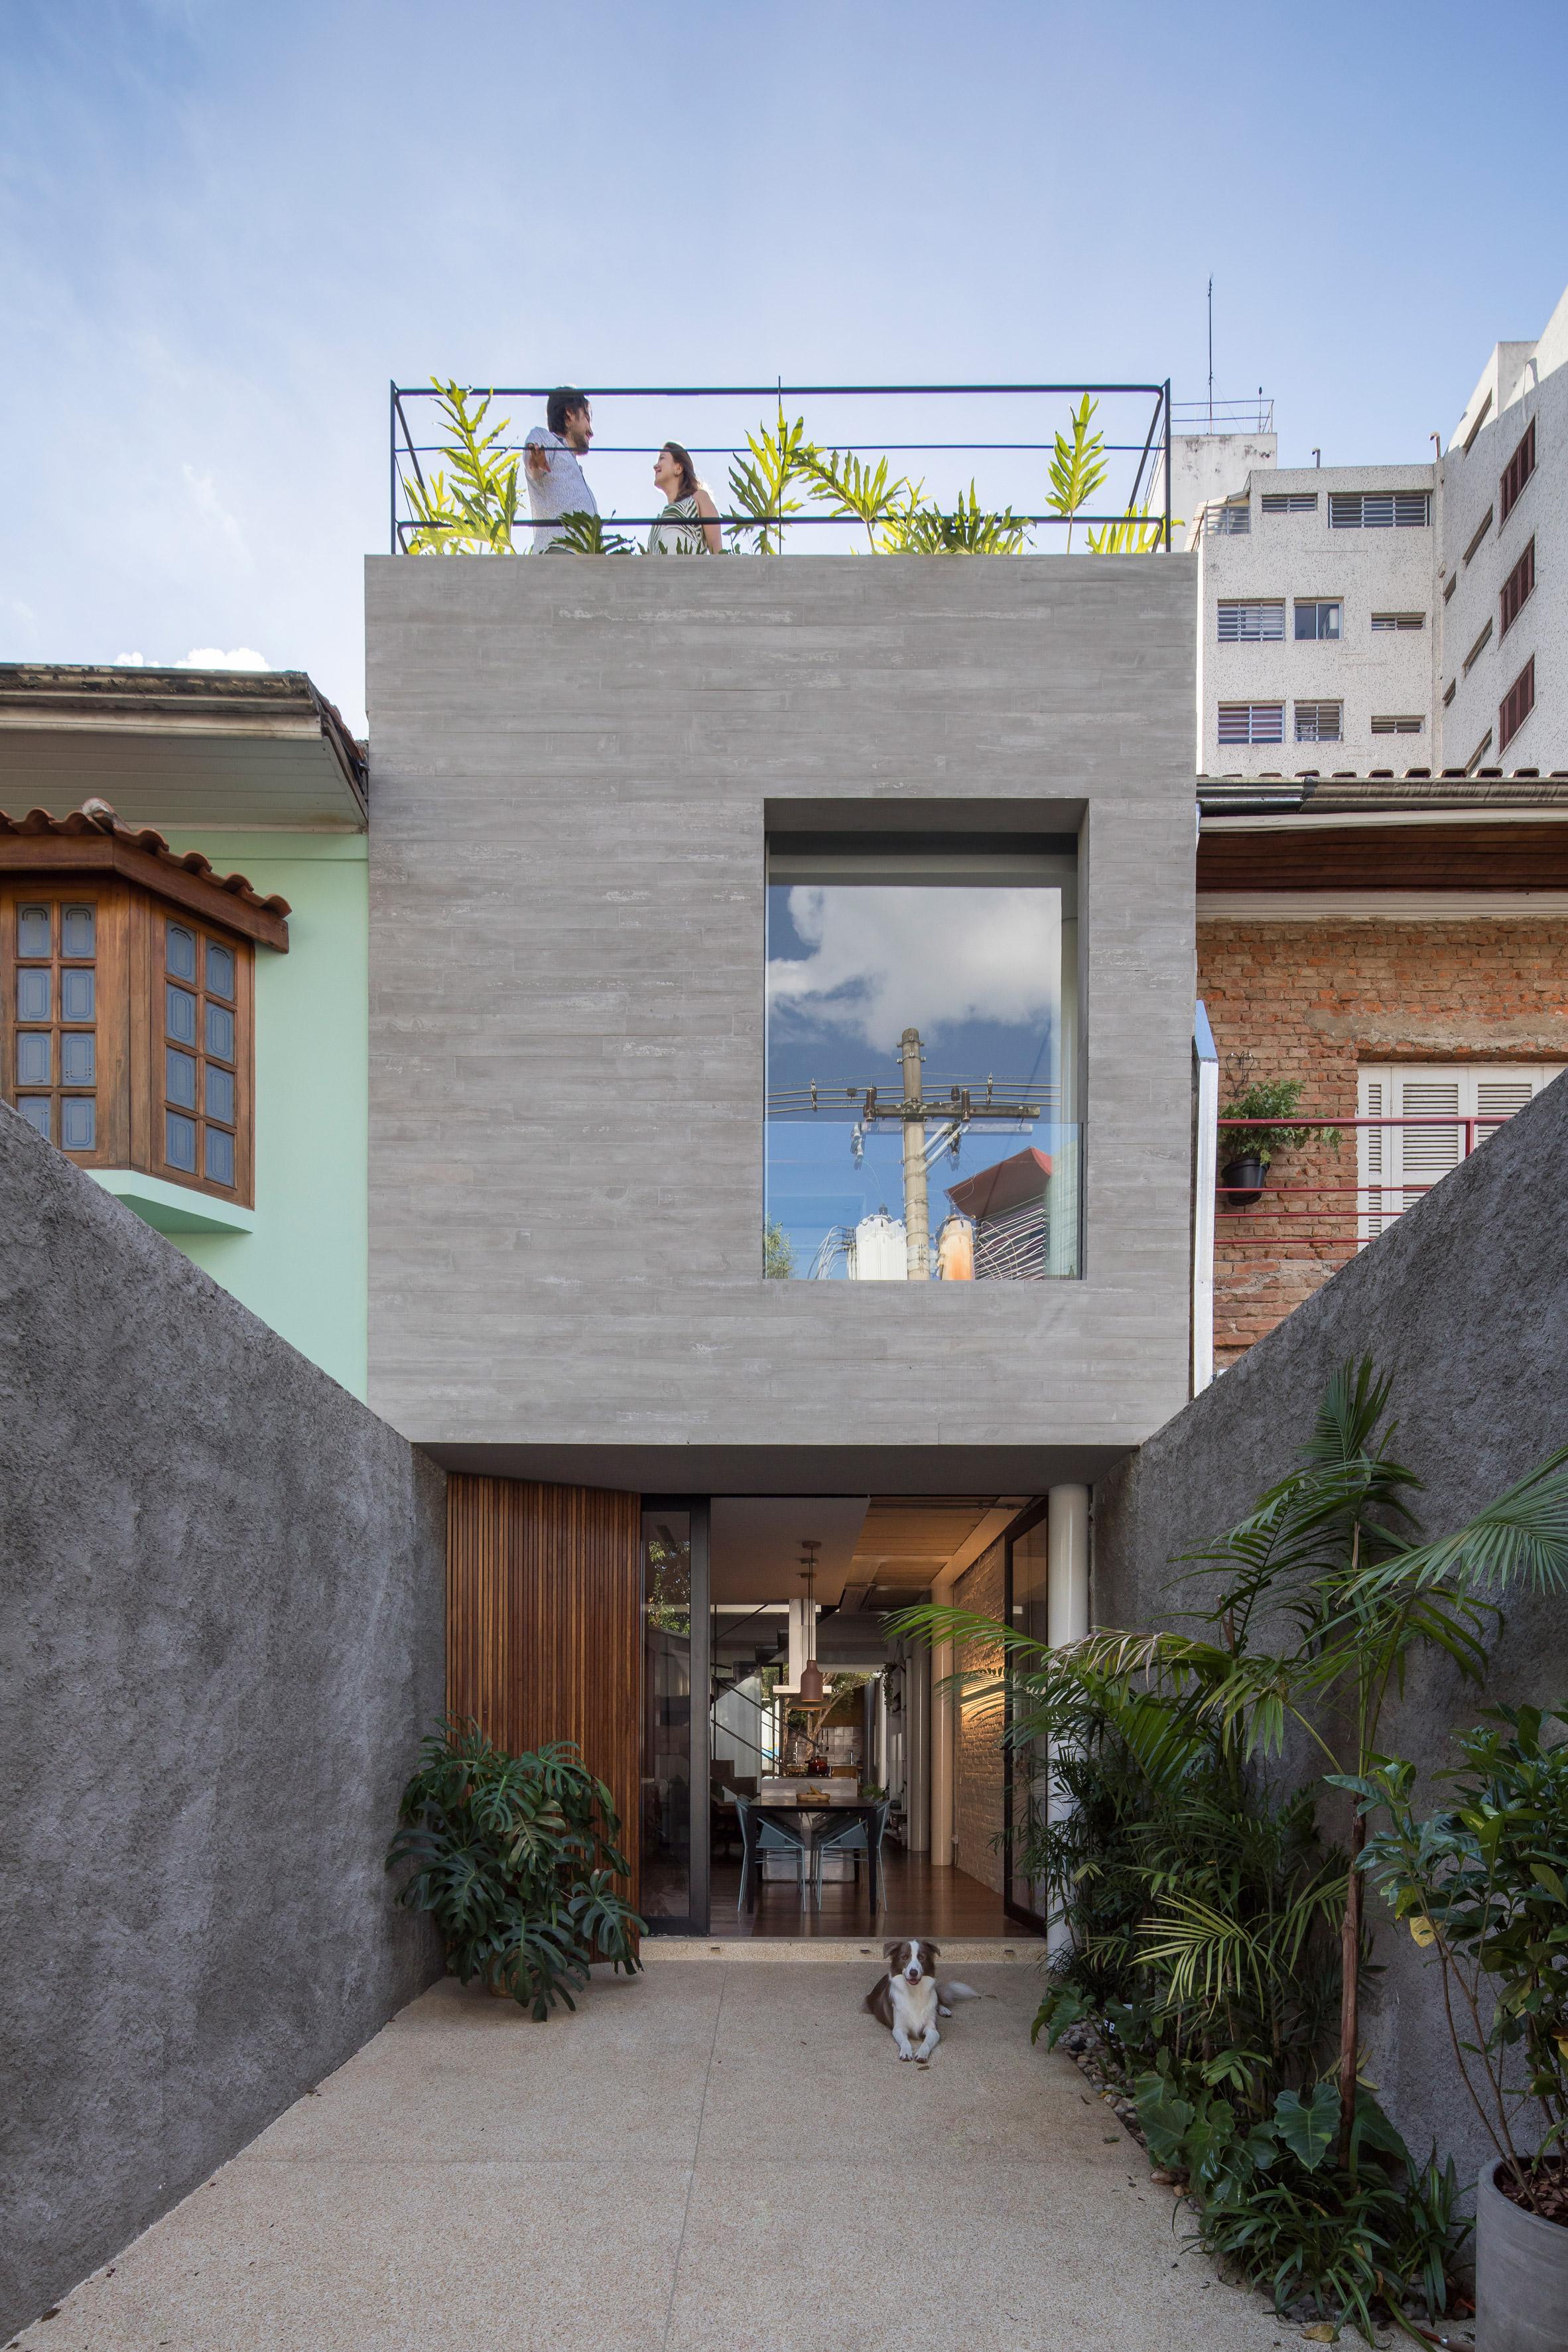 Estúdio BRA creates slender urban home for young couple in São Paulo